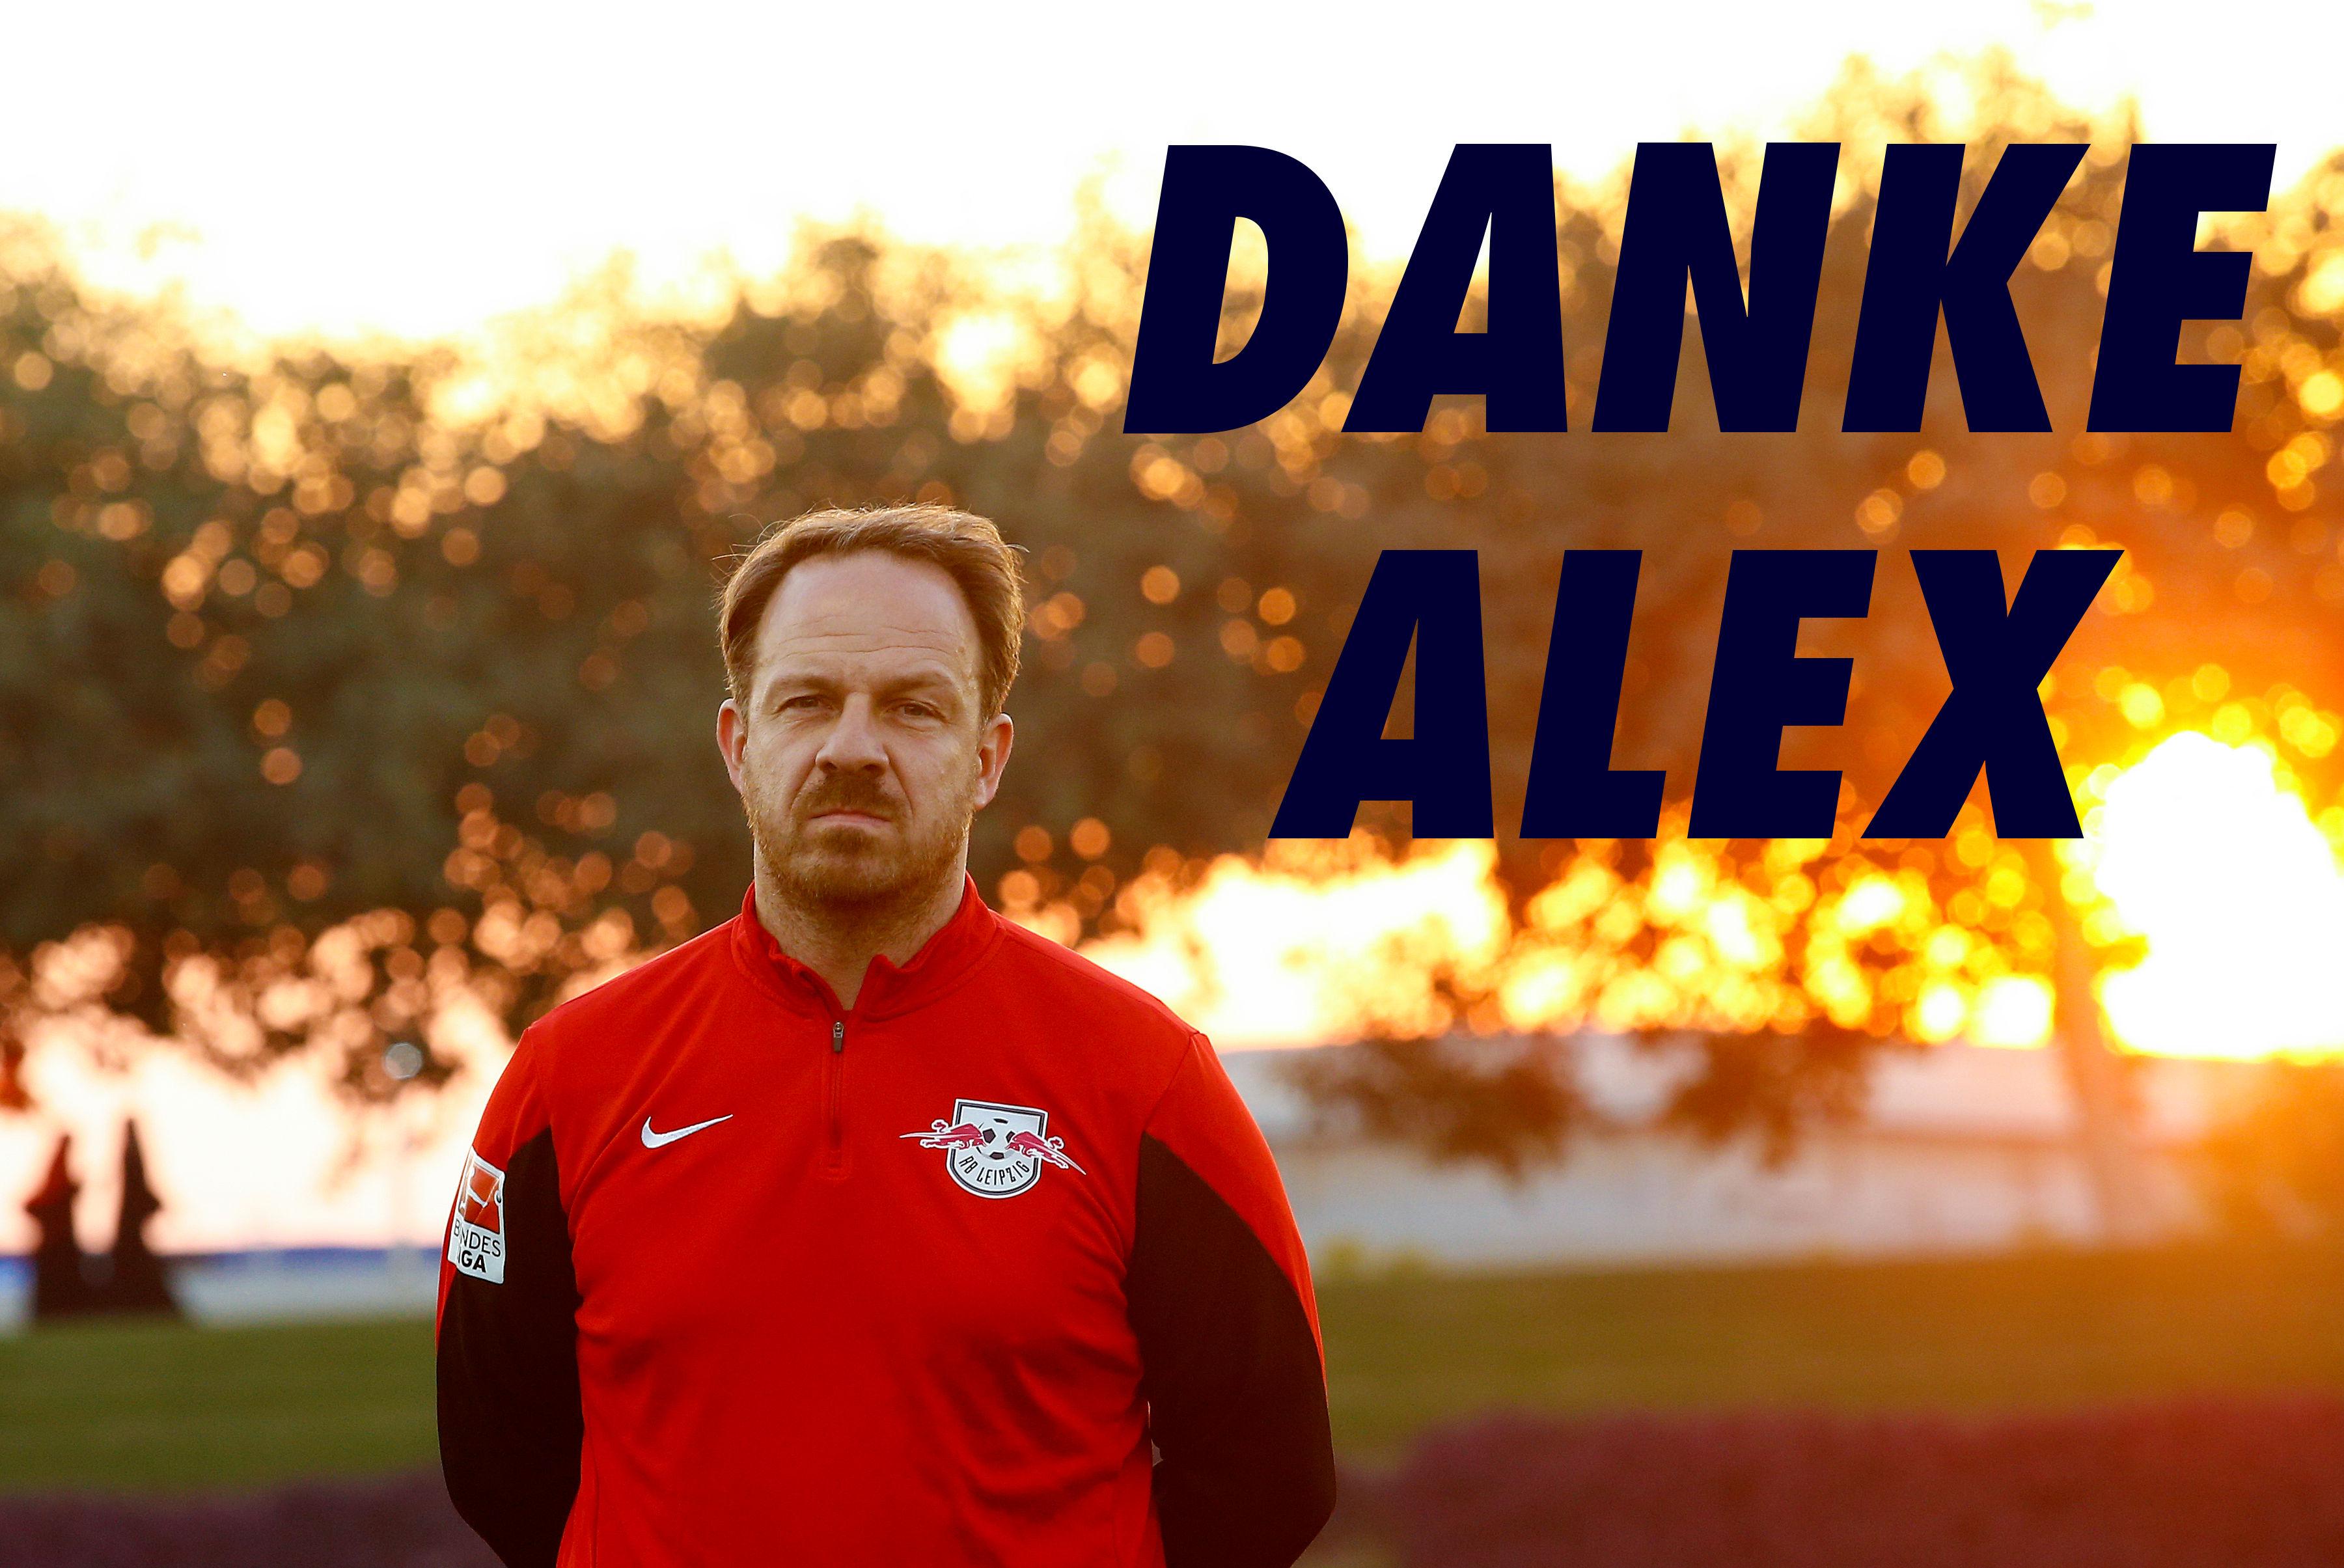 DANKE ALEX